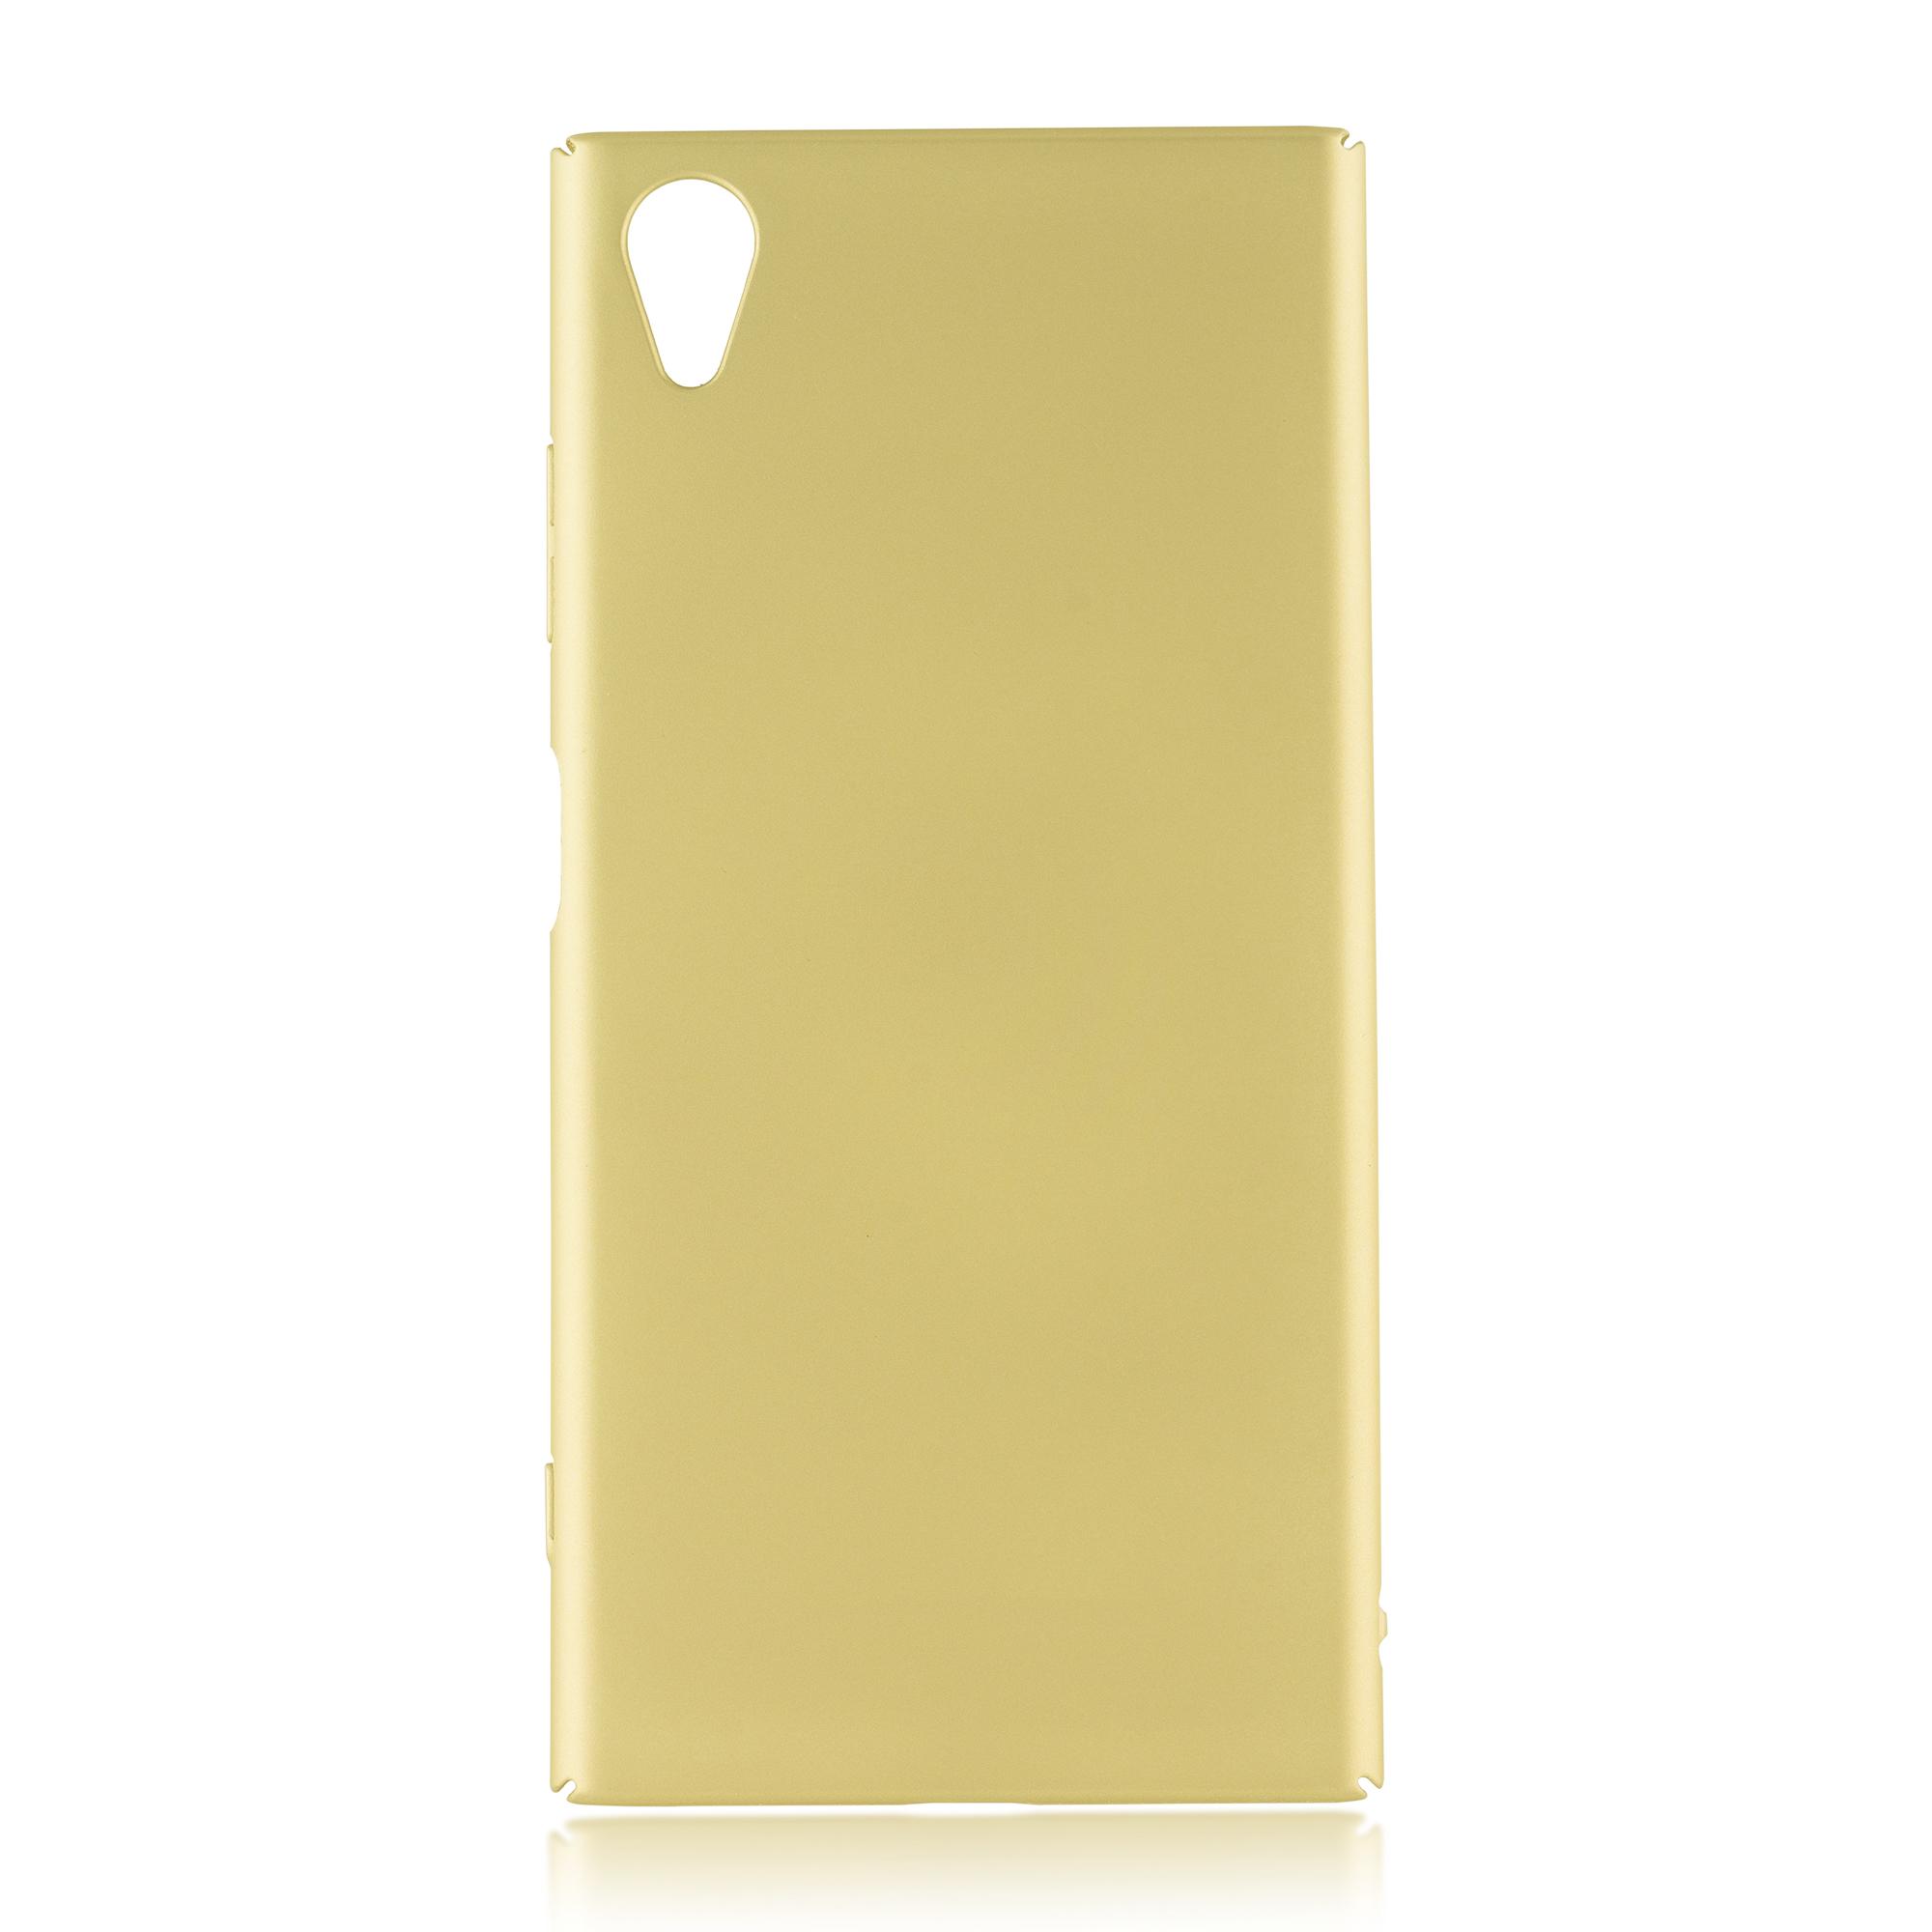 Накладка Brosco Soft-touch для Sony Xperia XA1 Plus, золотая